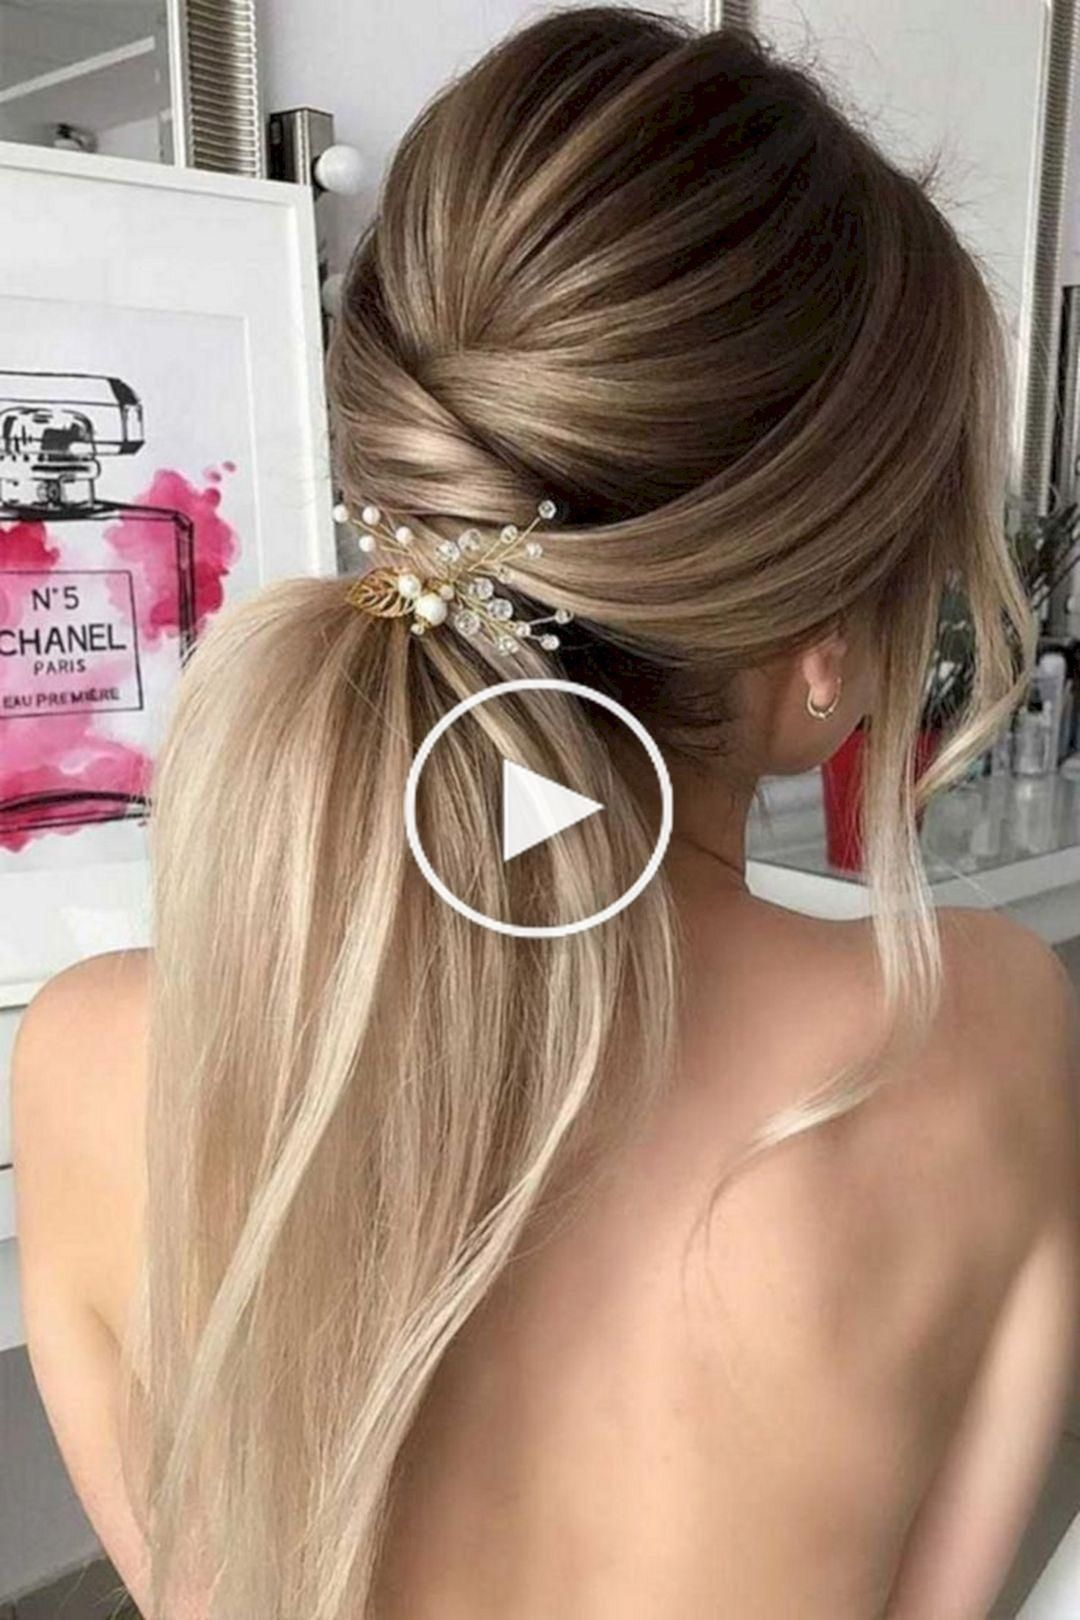 10 Stunning Women Christmas Hairstyle Ideas To Inspire You Great Idea 10 Stunning Wo Haarschnitt Schichten Brautjungfern Frisuren Kurze Haare Frisur Ideen